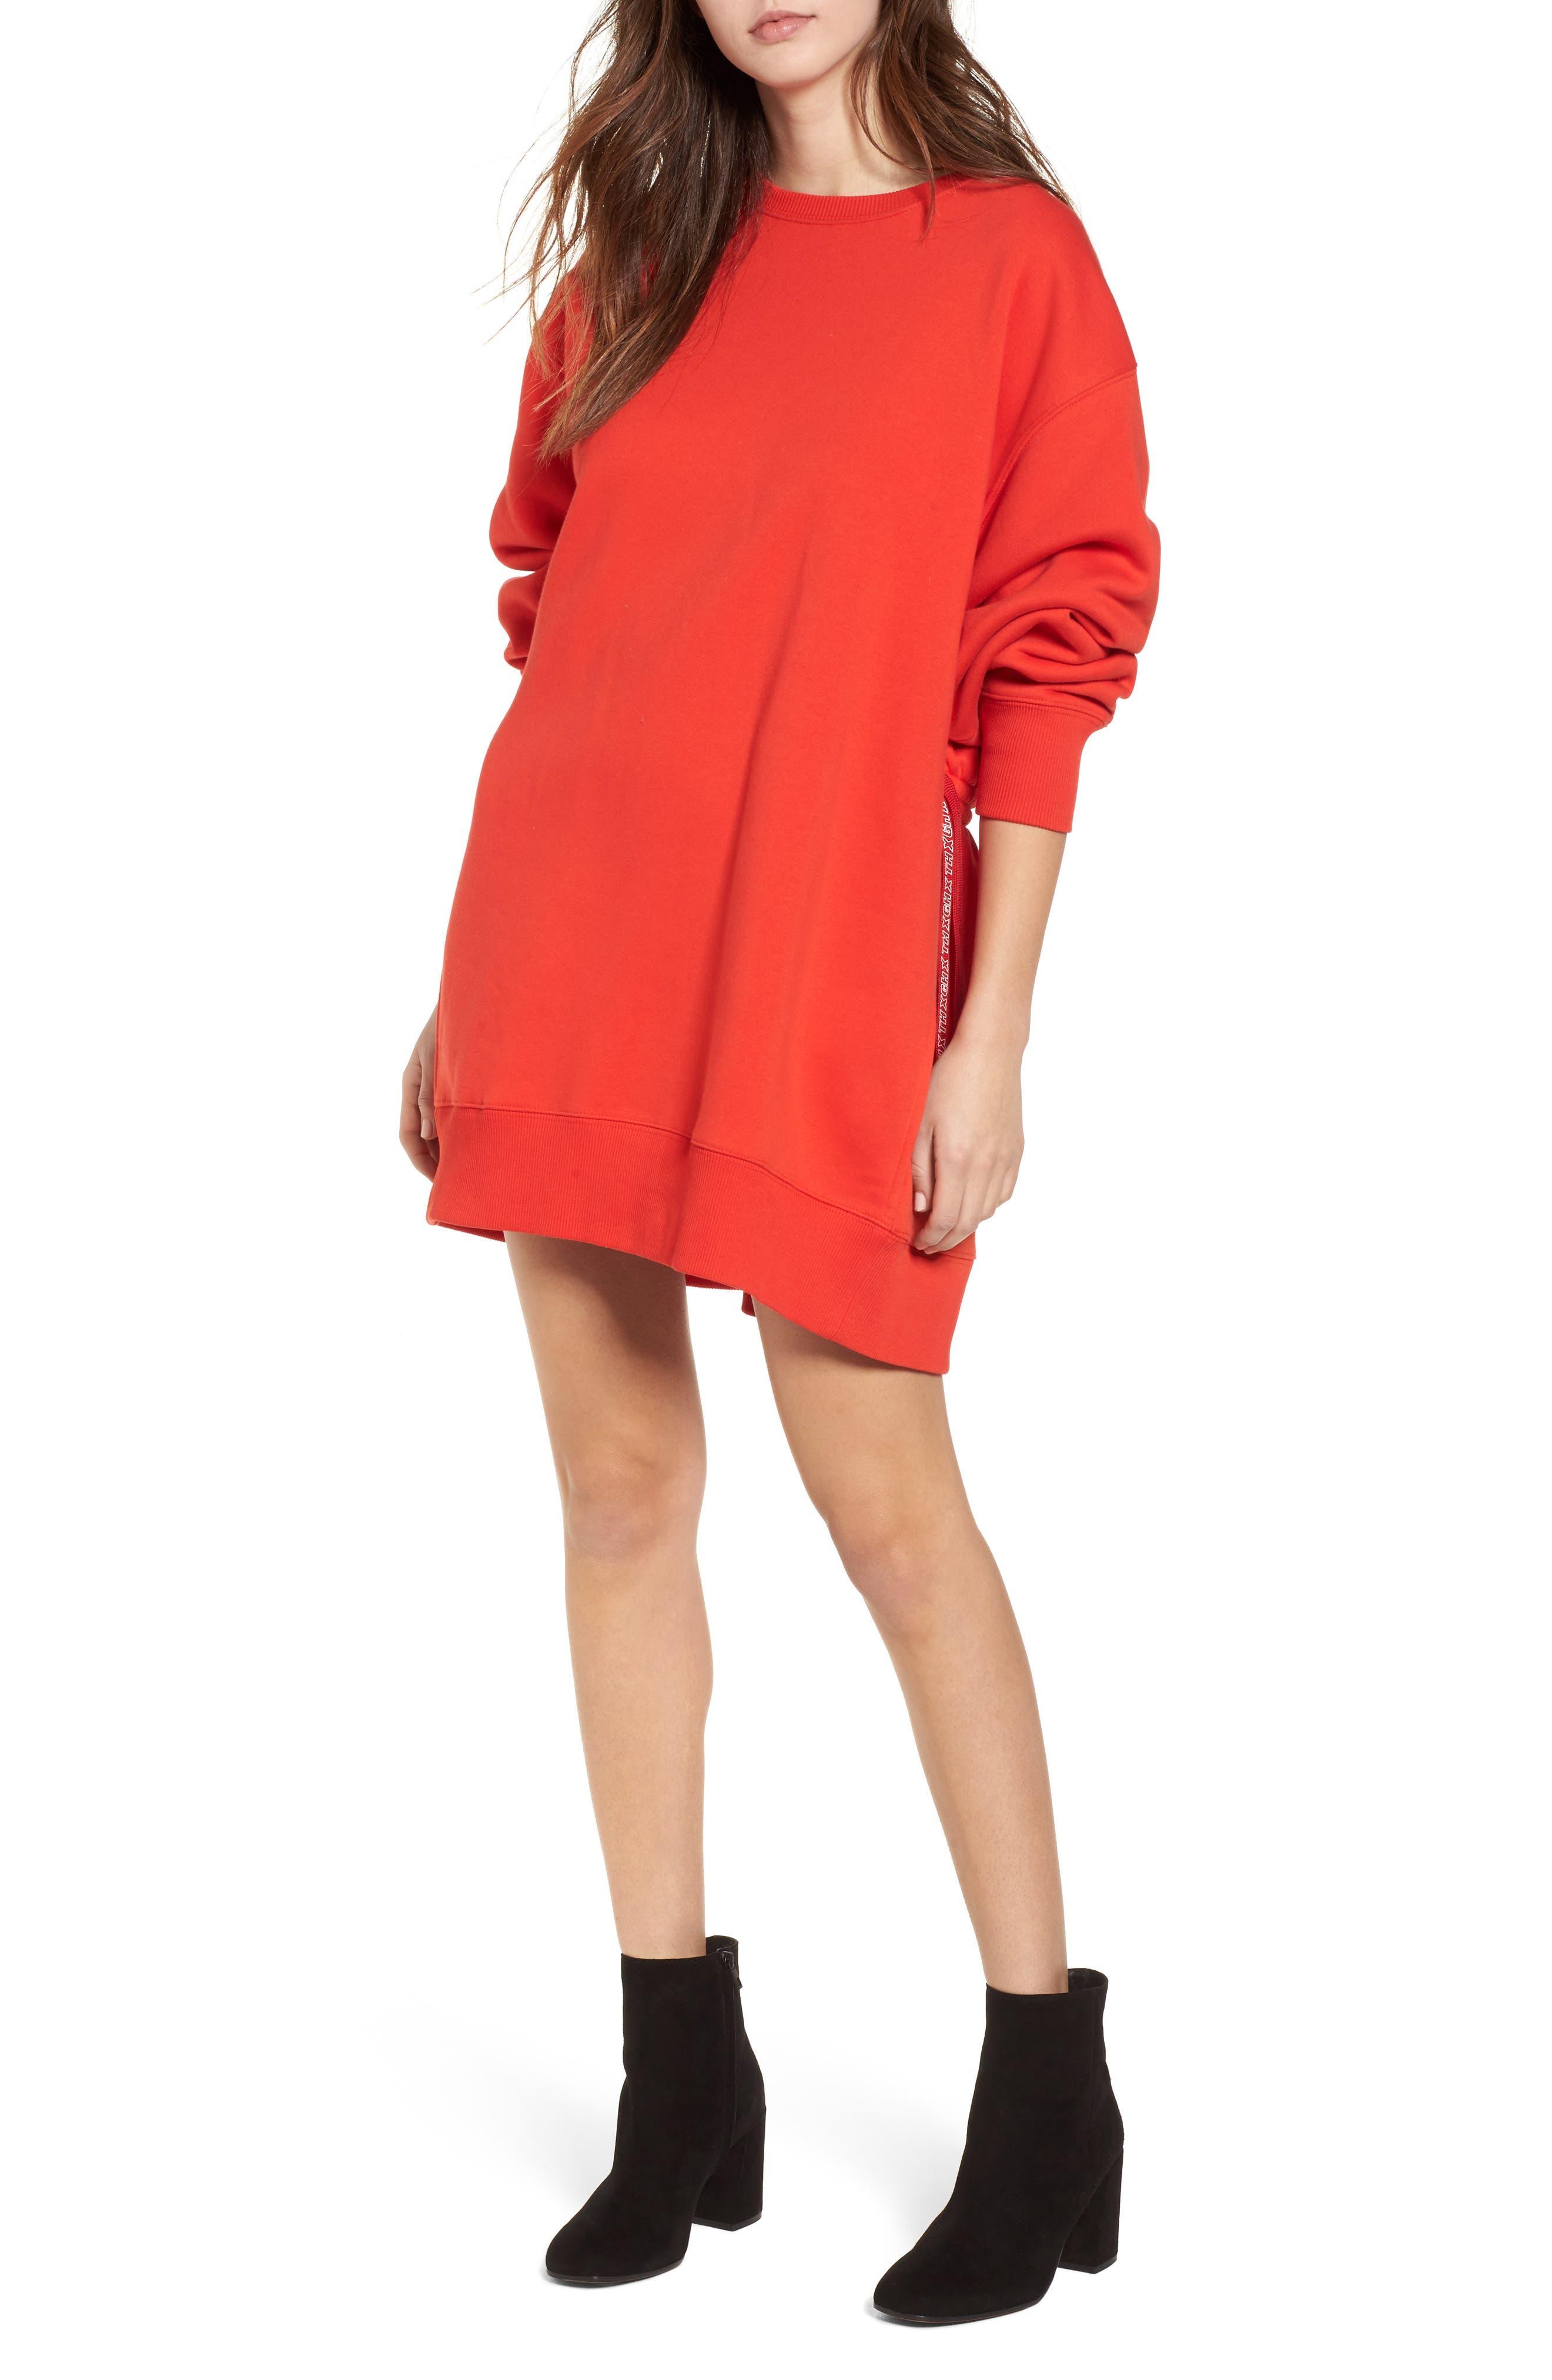 TOMMY JEANS x Gigi Hadid Sweatshirt Dress